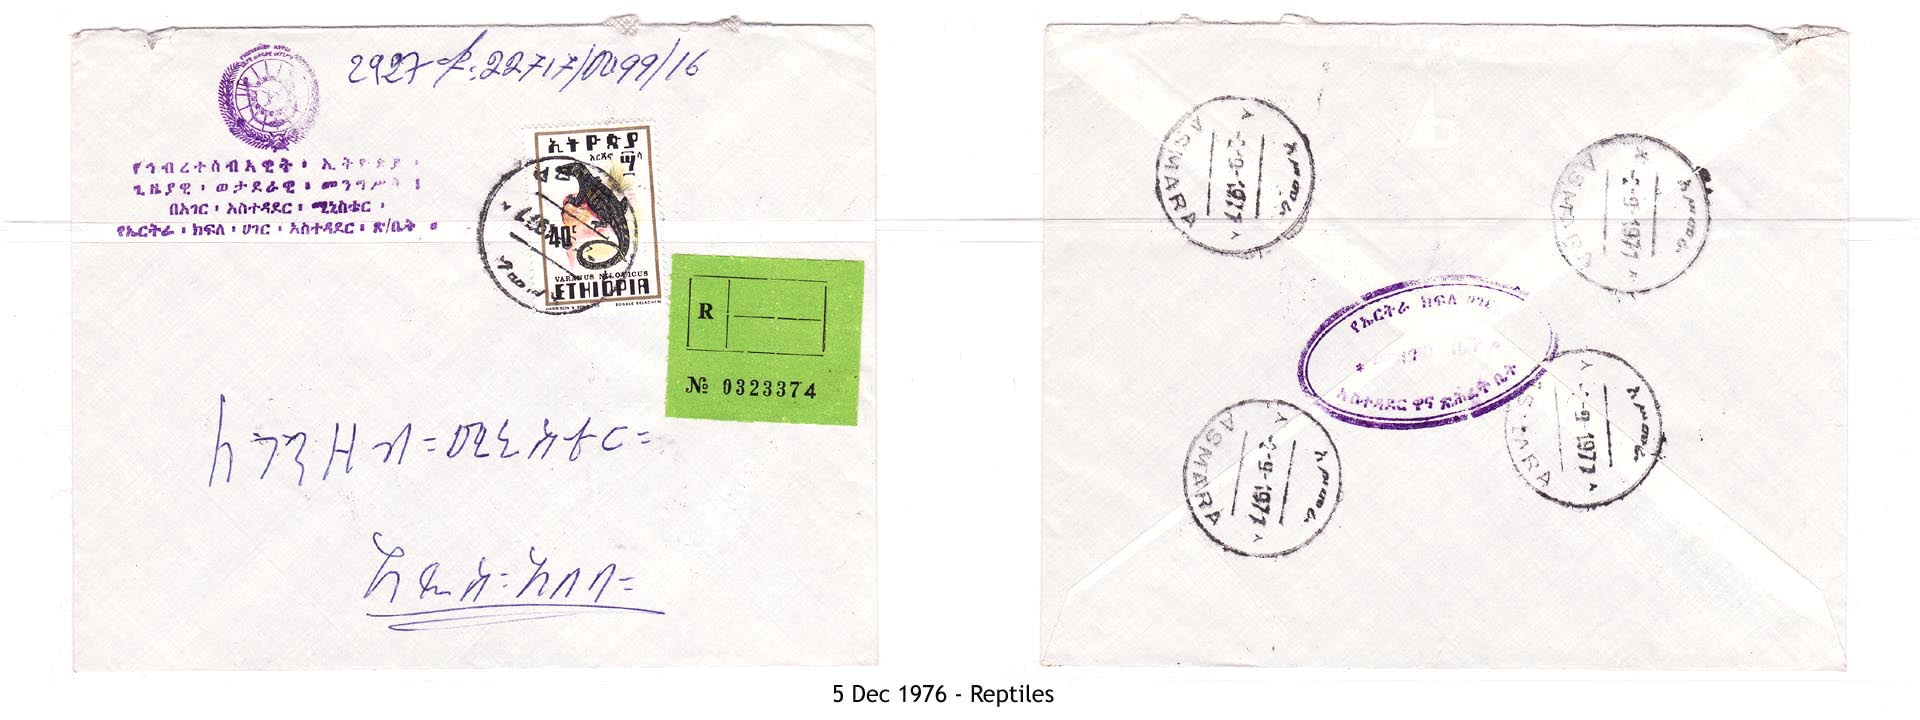 19761205 - Reptiles